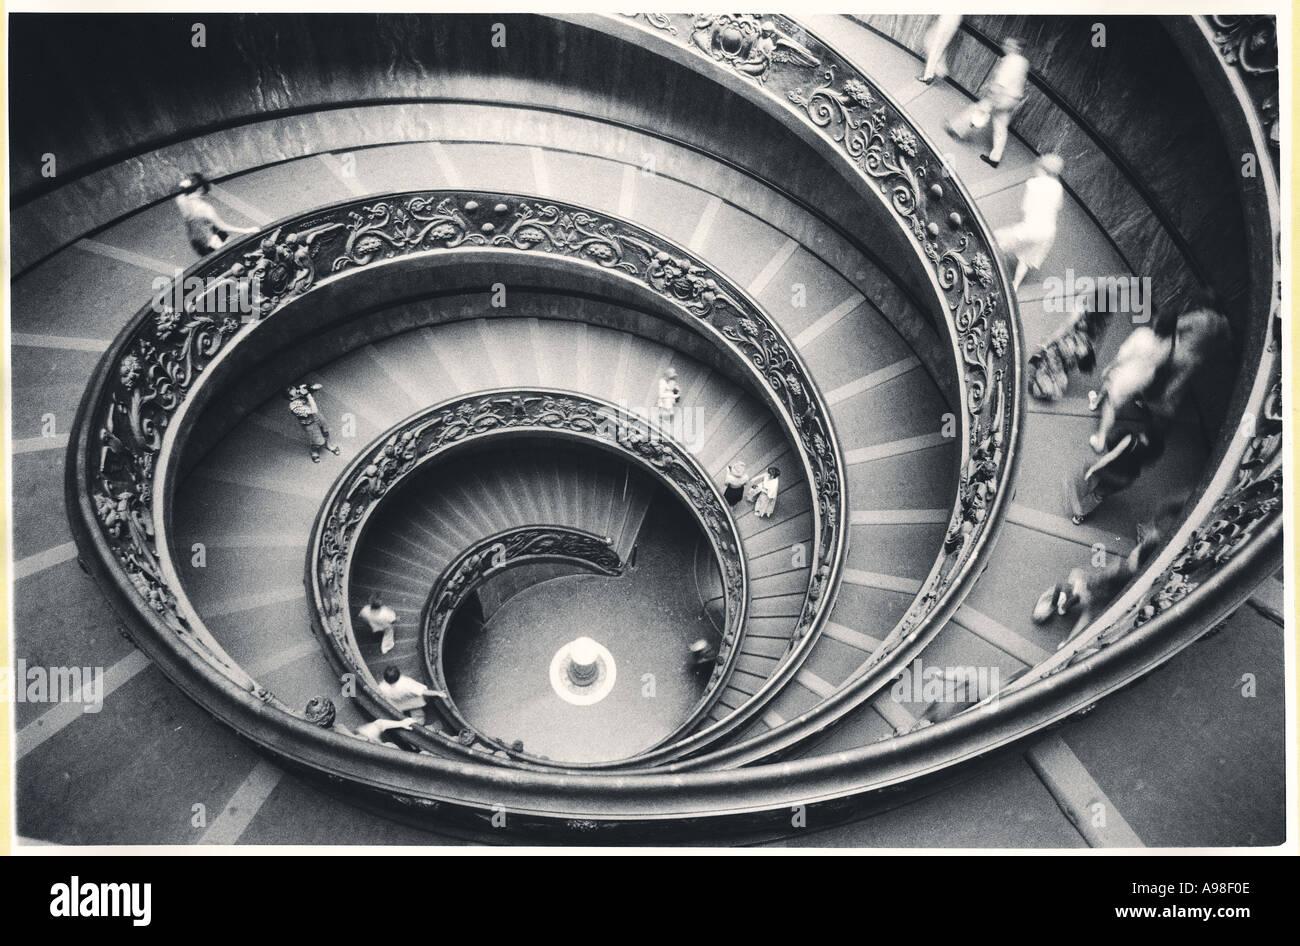 Spiral staircase in Black White - Stock Image